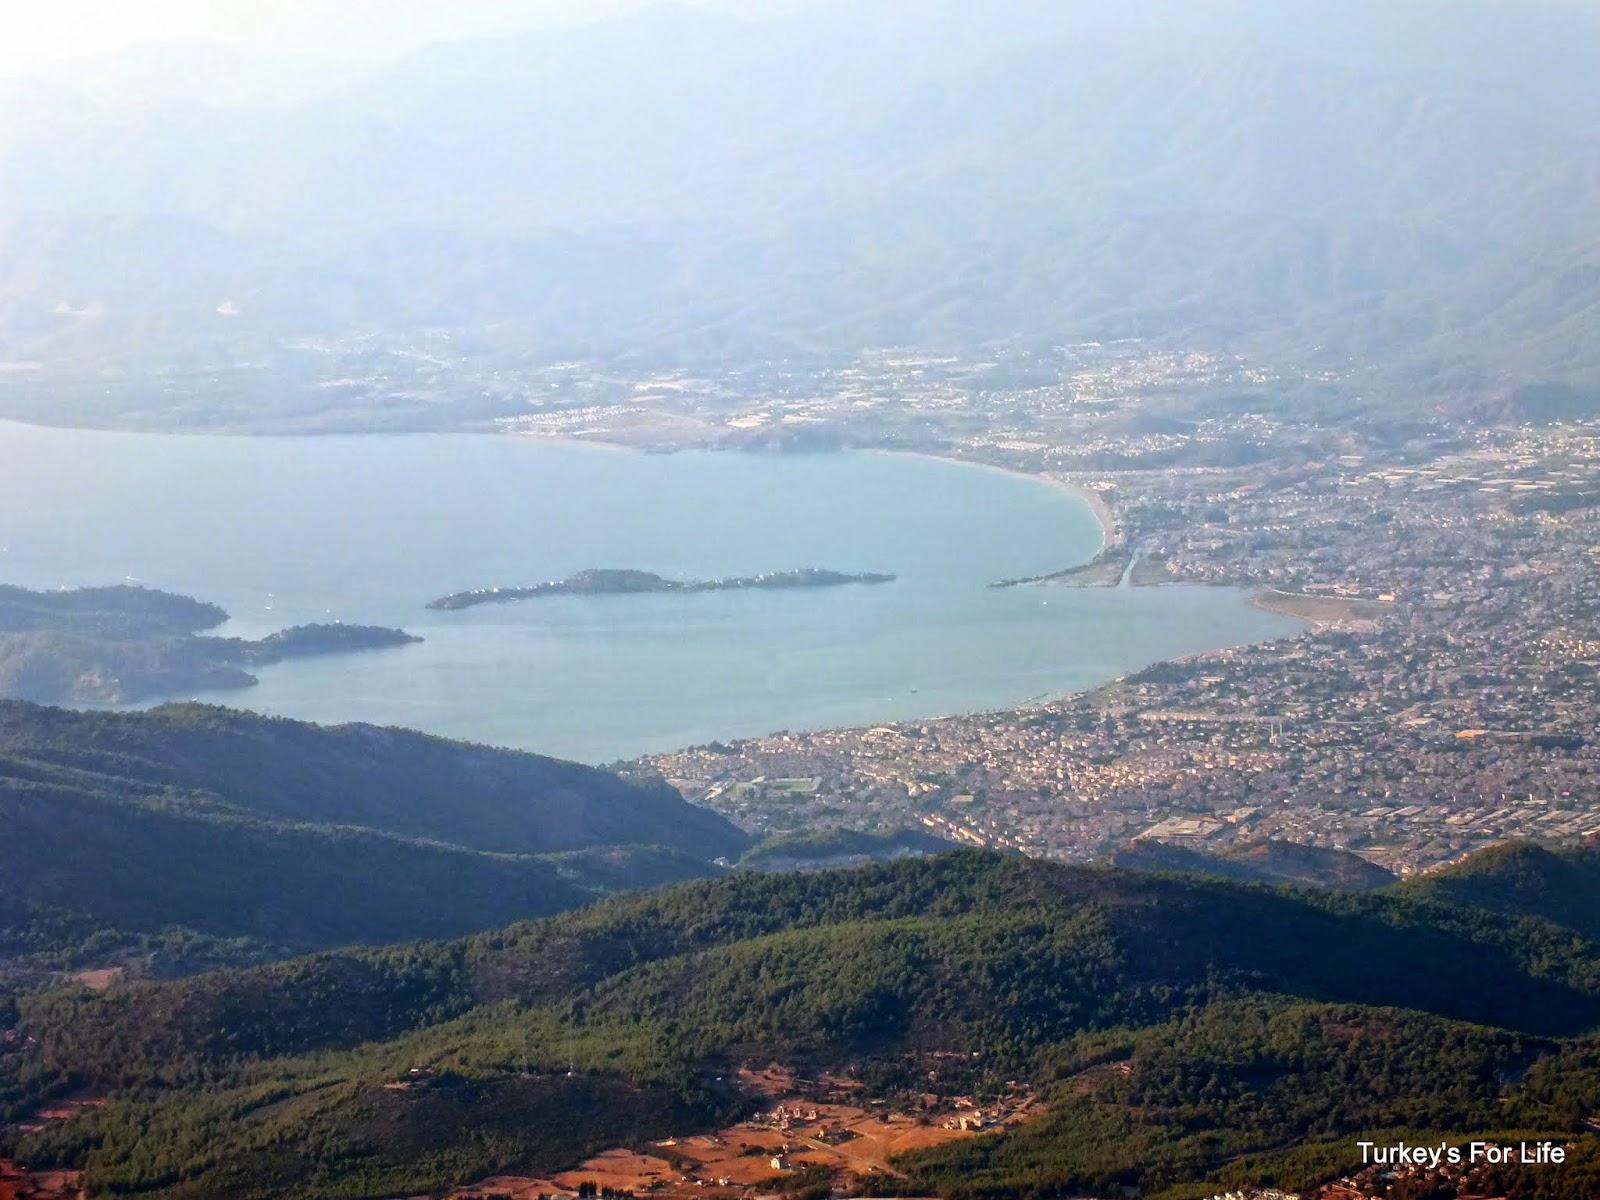 Fethiye Views From Babadağ Mountain